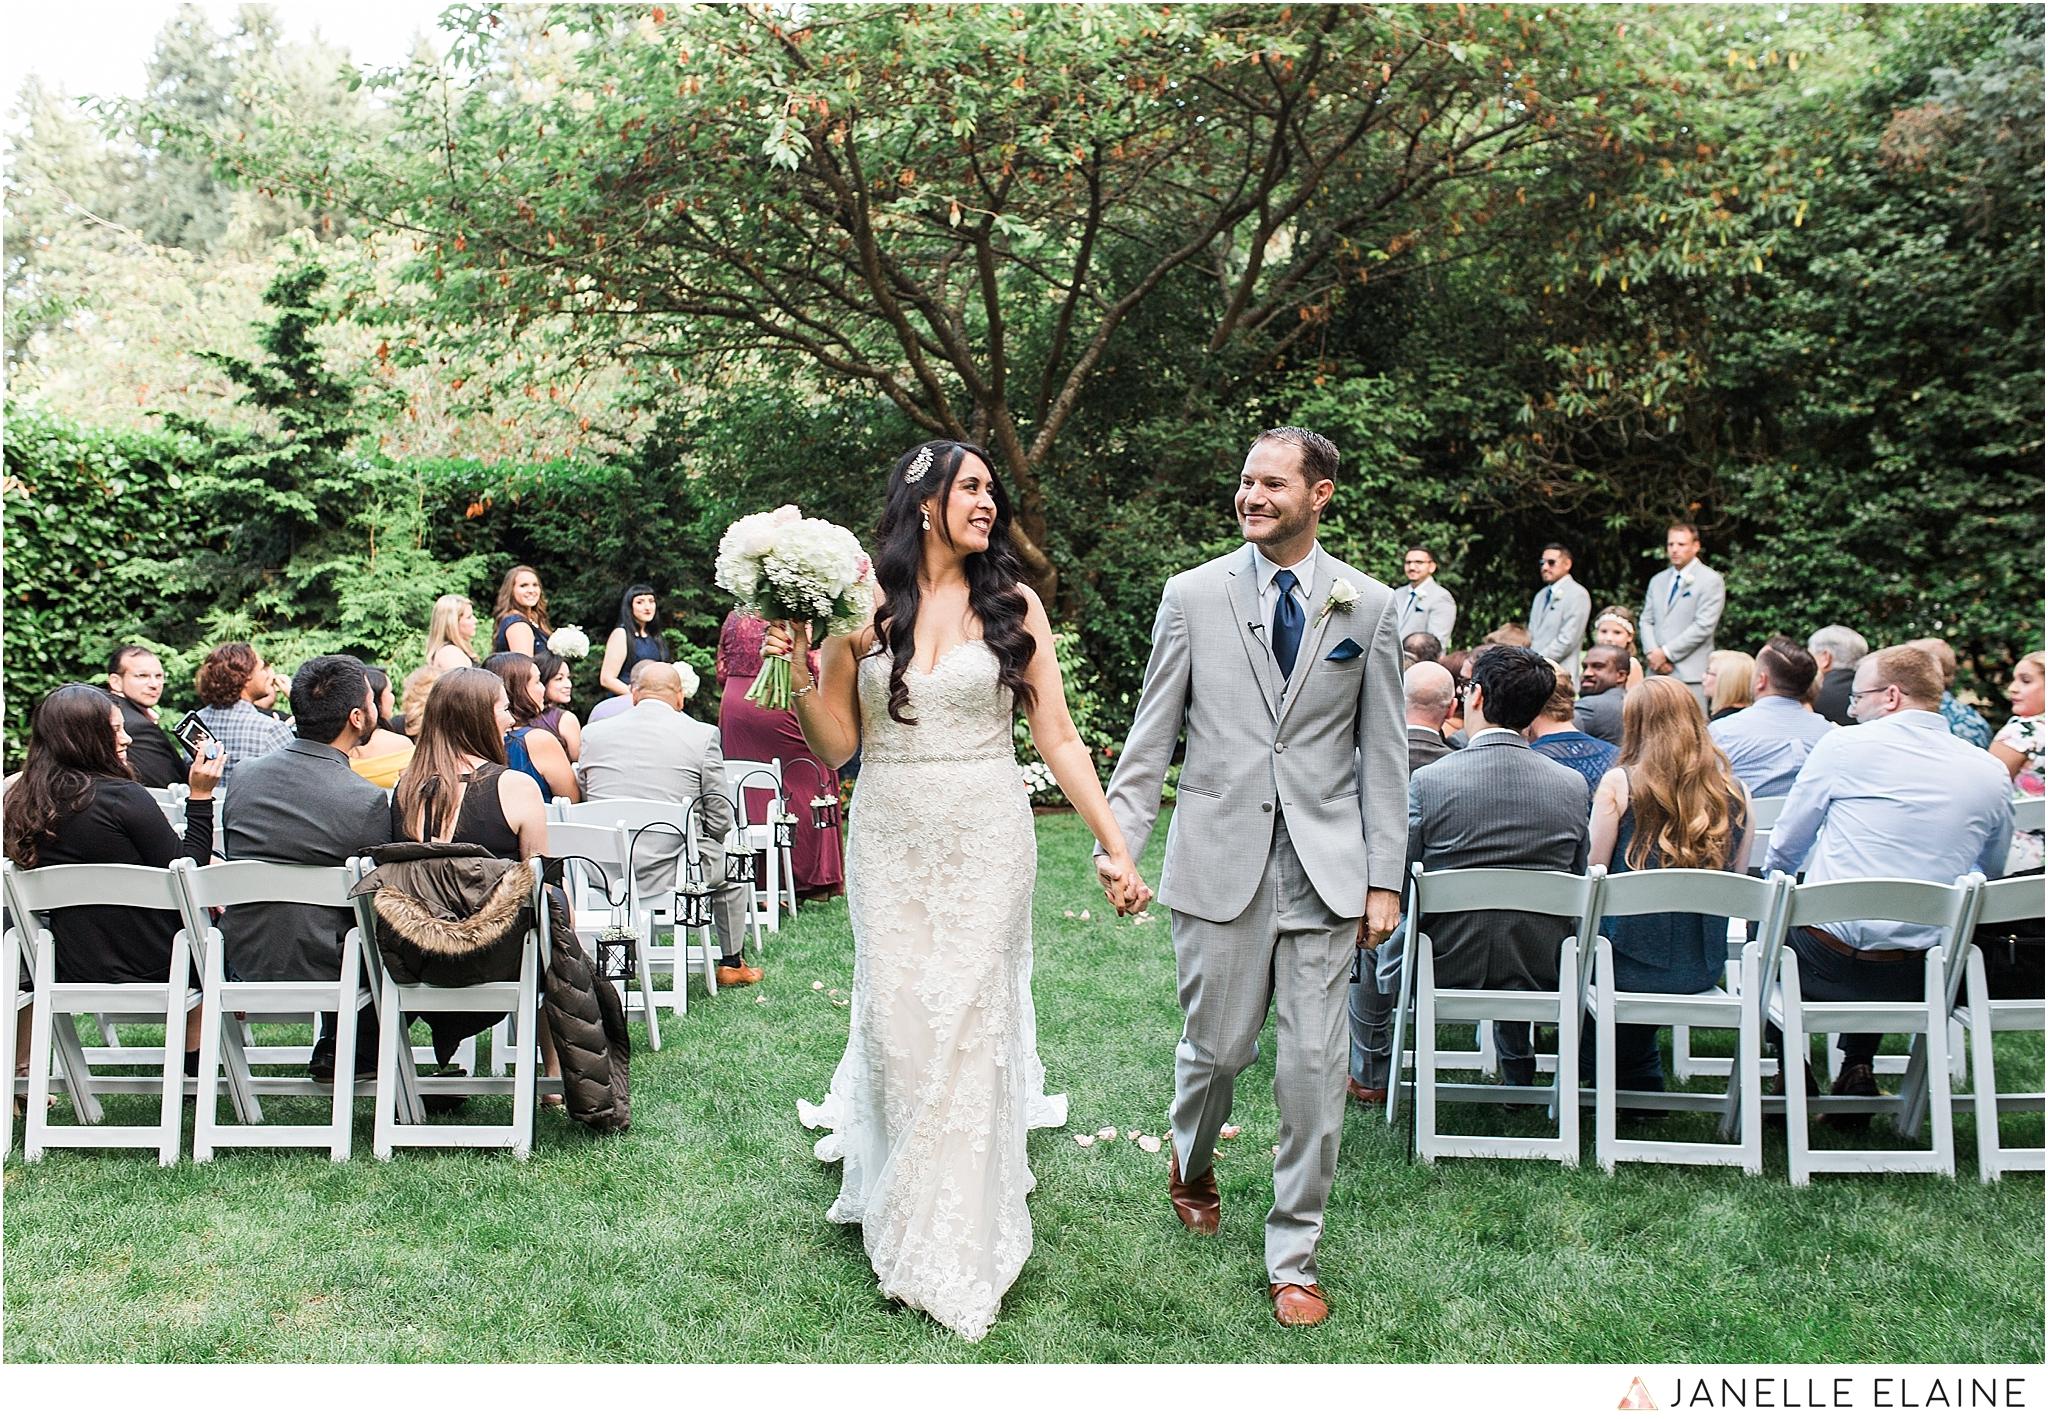 janelle elaine photography-professional wedding photographer-seattle-bellevue-robinswood house-177.jpg